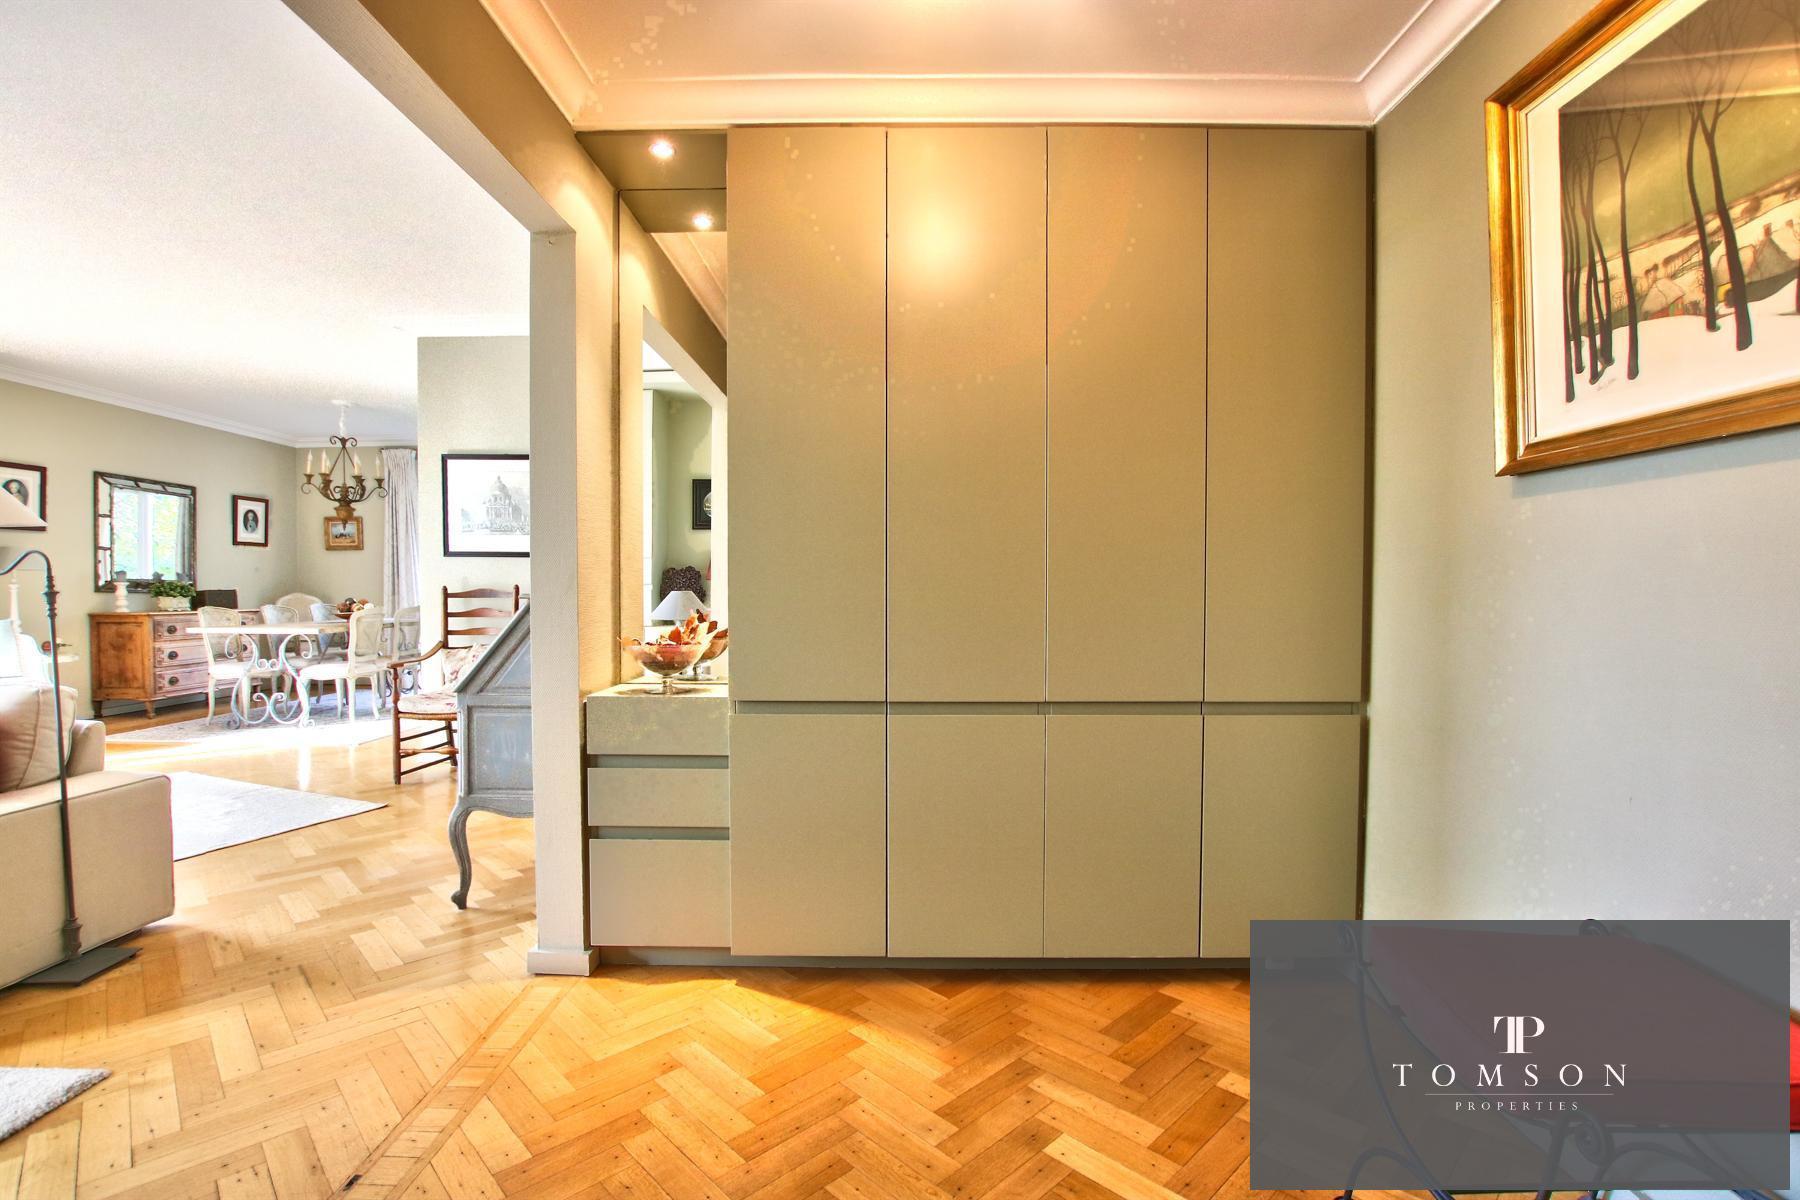 Appartement - Watermael-Boitsfort - #4520854-7